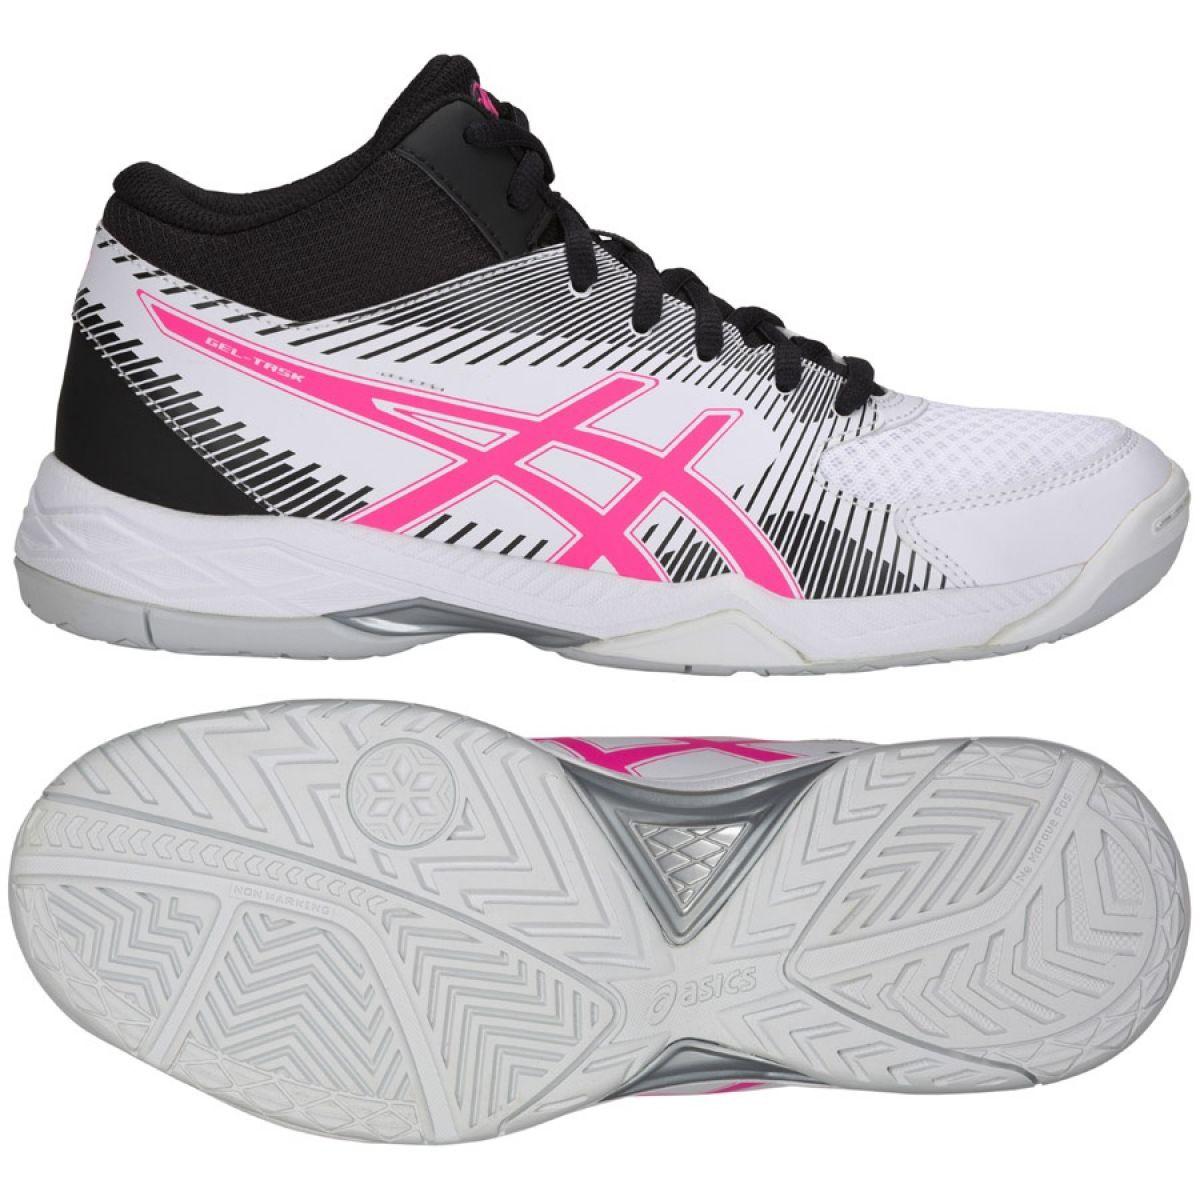 Zapatillas de voleibol Asics Gel Task Mt W B753Y 100